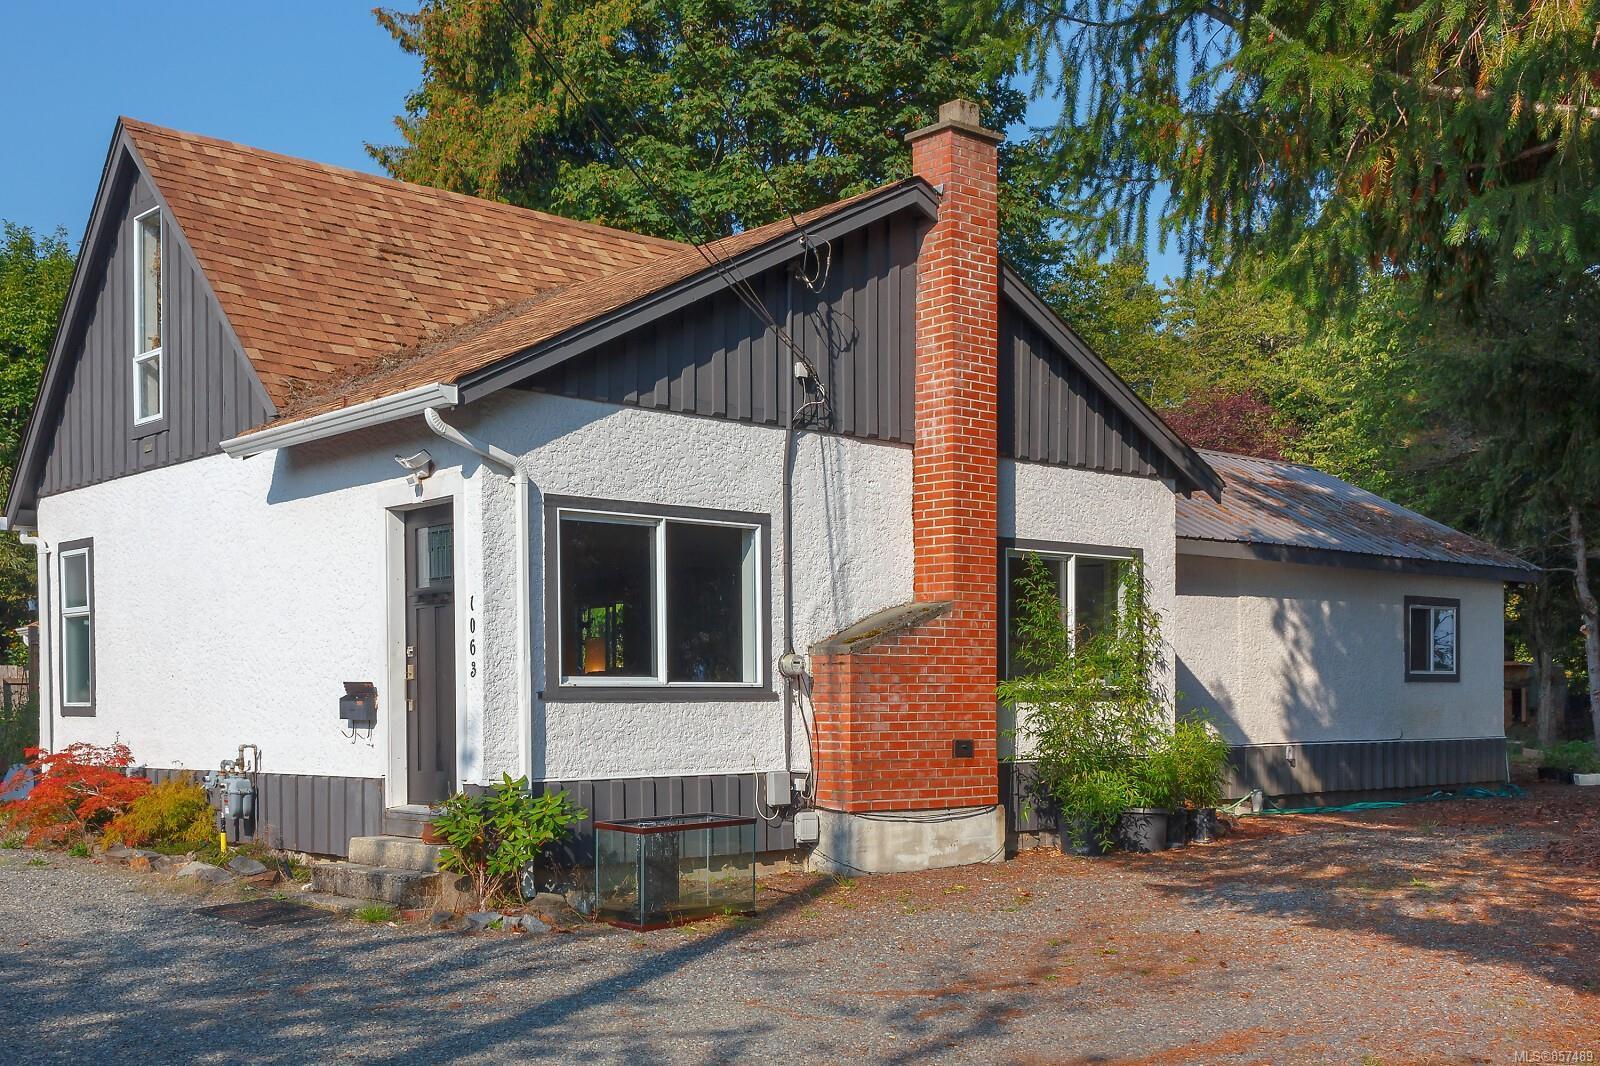 Main Photo: 1063 Vista Ave in : Du West Duncan House for sale (Duncan)  : MLS®# 857489